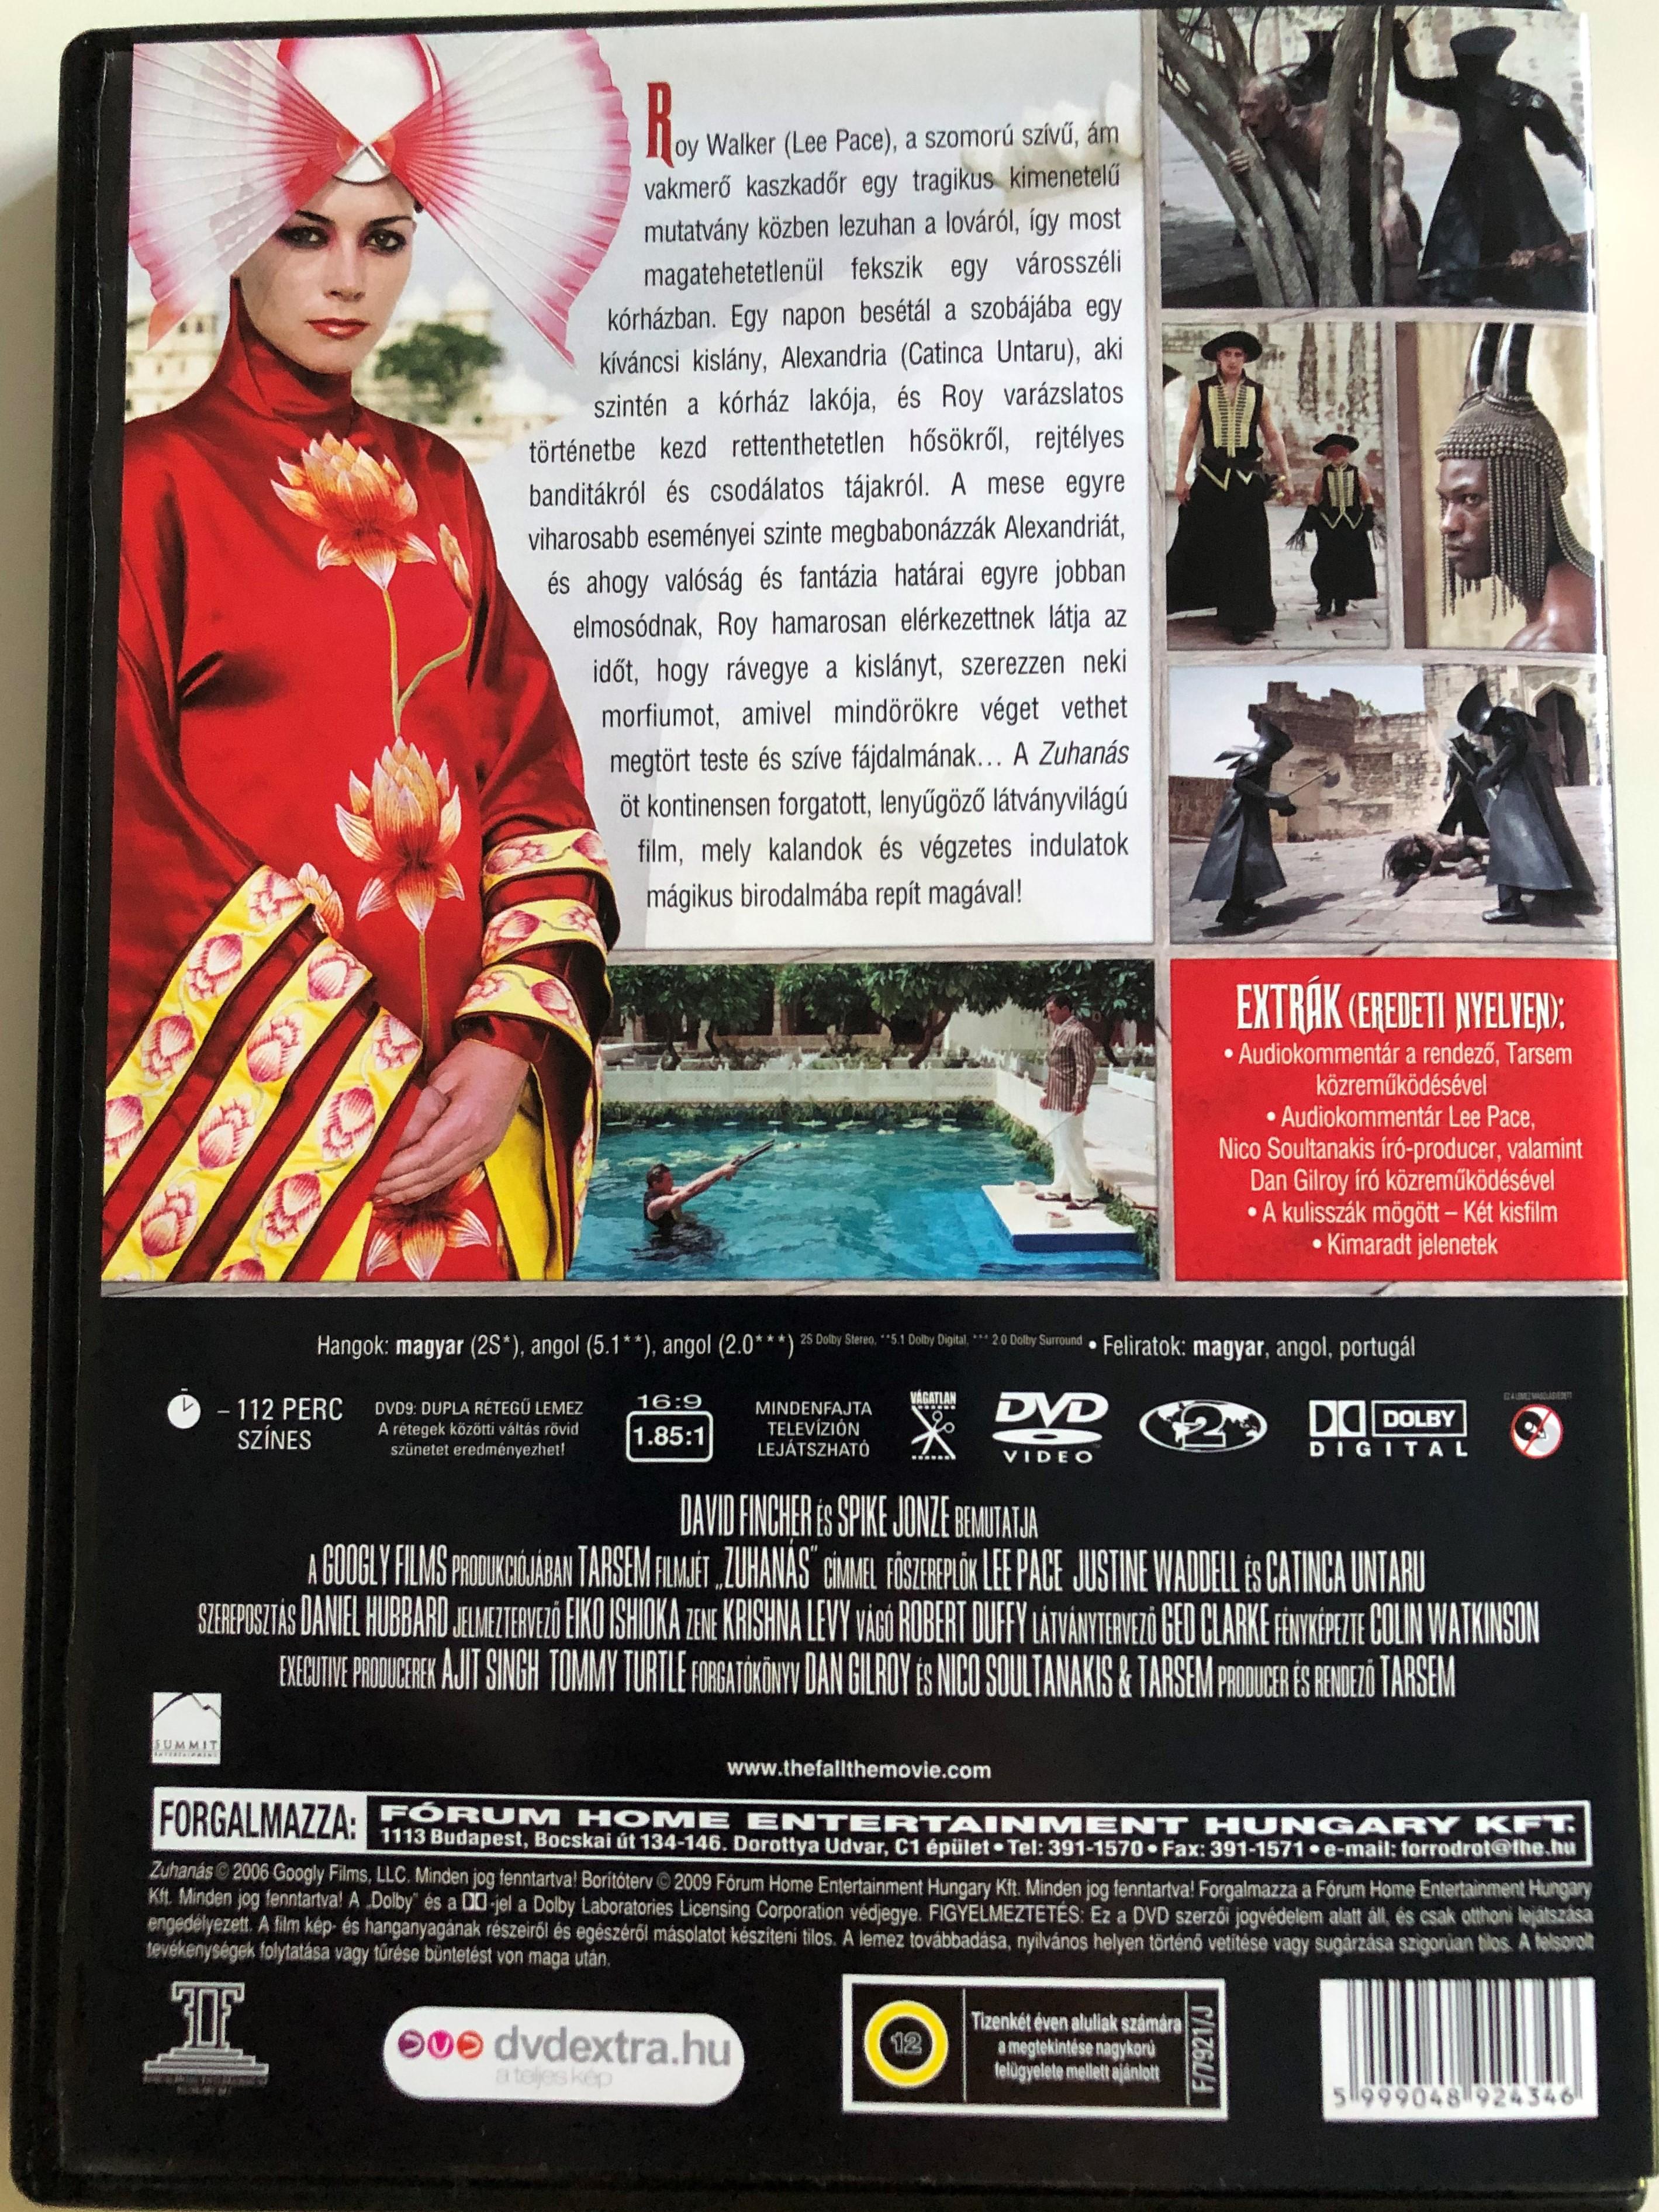 the-fall-dvd-2006-zuhan-s-directed-by-tarsem-starring-lee-pace-justine-waddell-catinca-untaru-2-.jpg